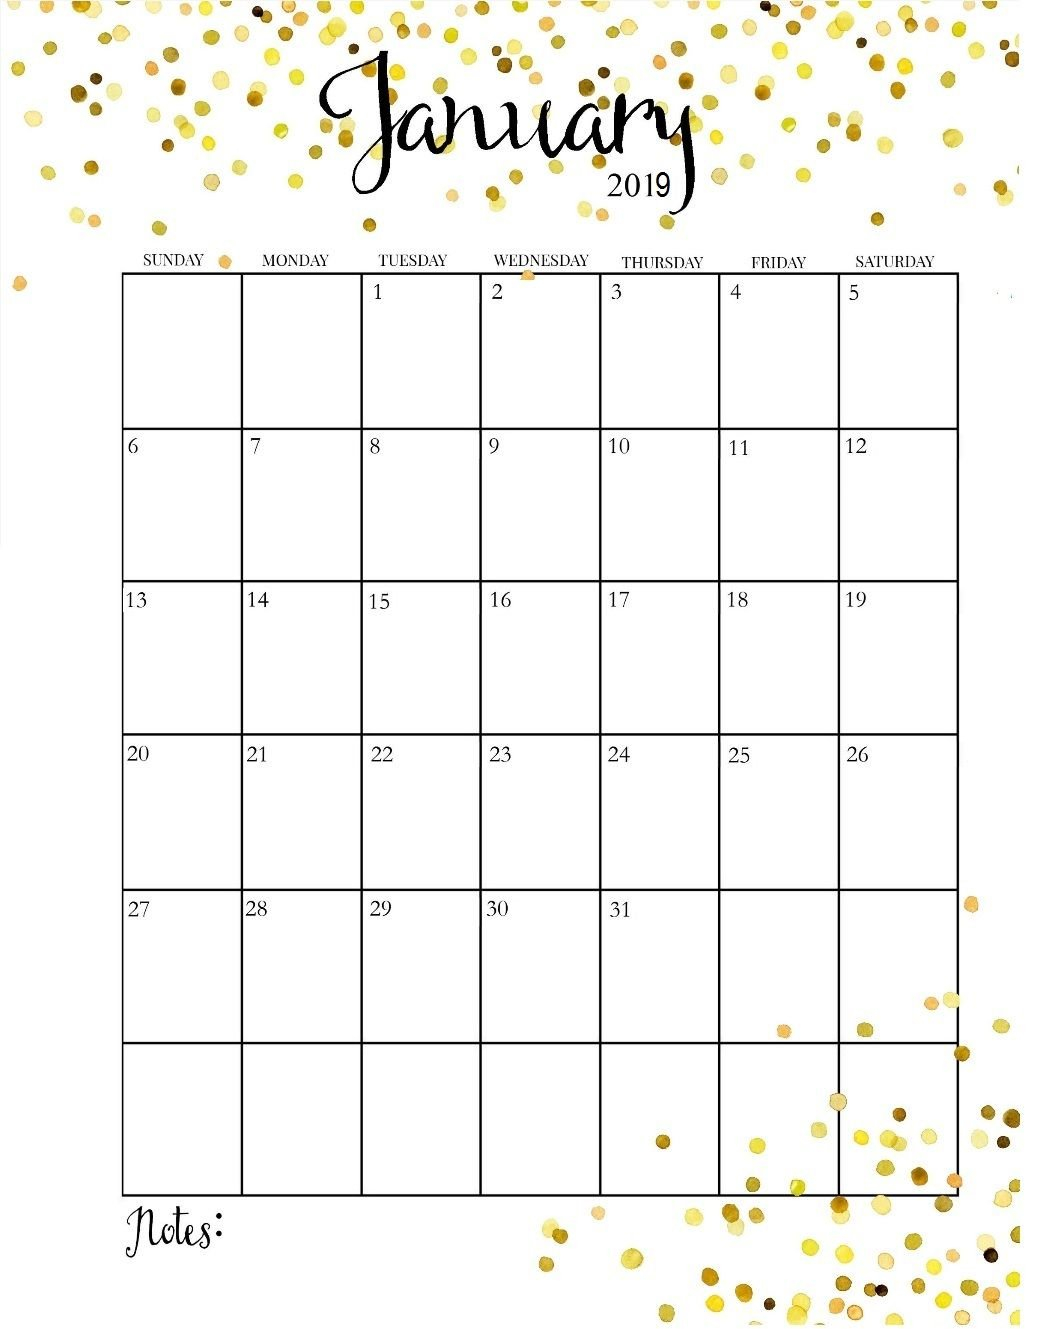 Printable Calendar 2019 Pretty | Printable Calendar 2019 Calendar 2019 Pretty